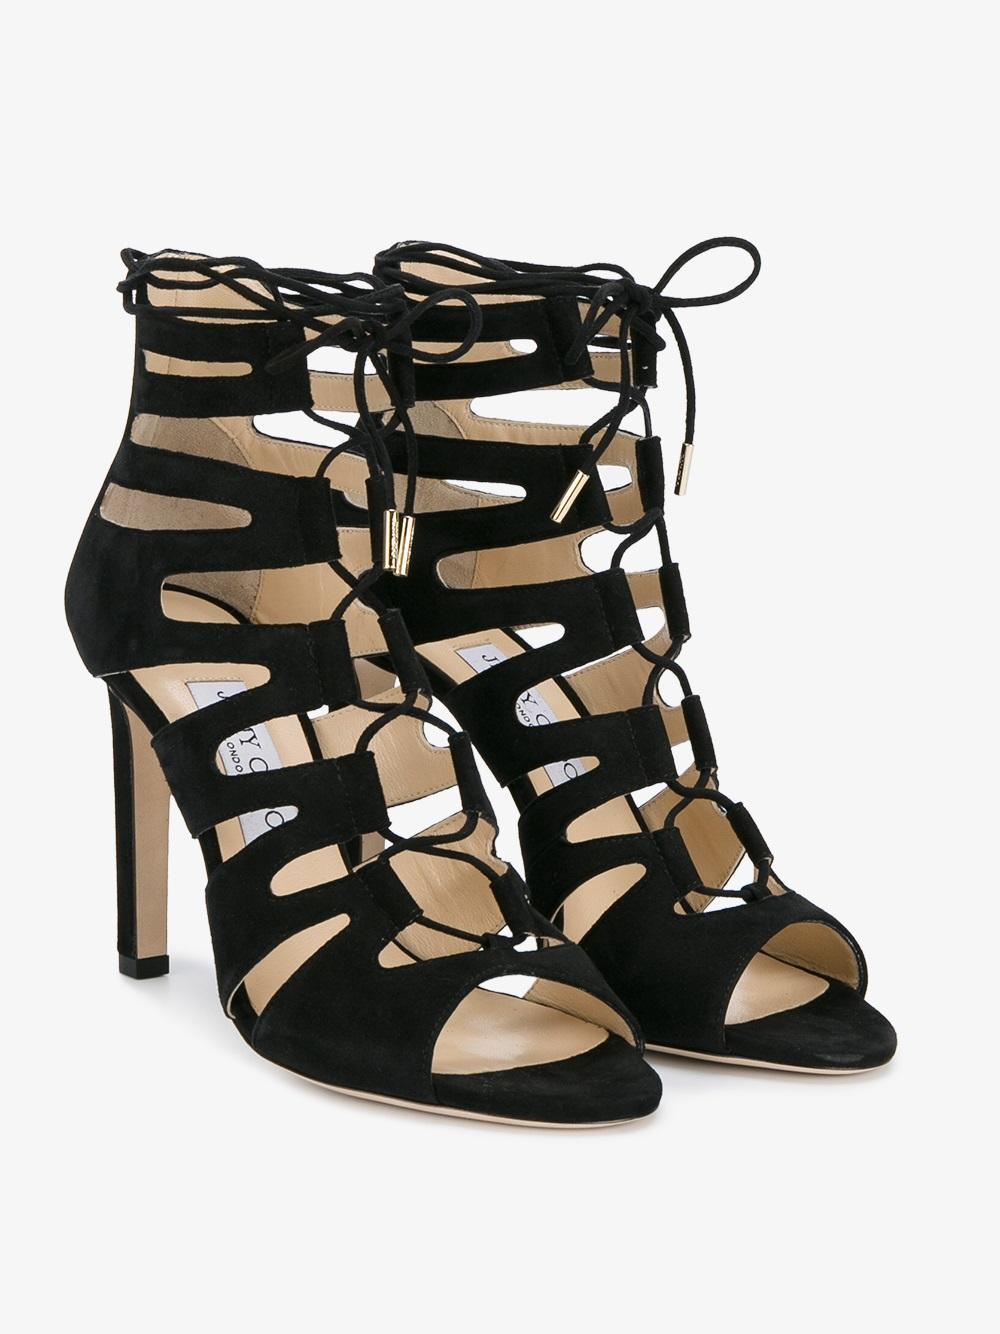 Jimmy Choo Hitch 100 sandals